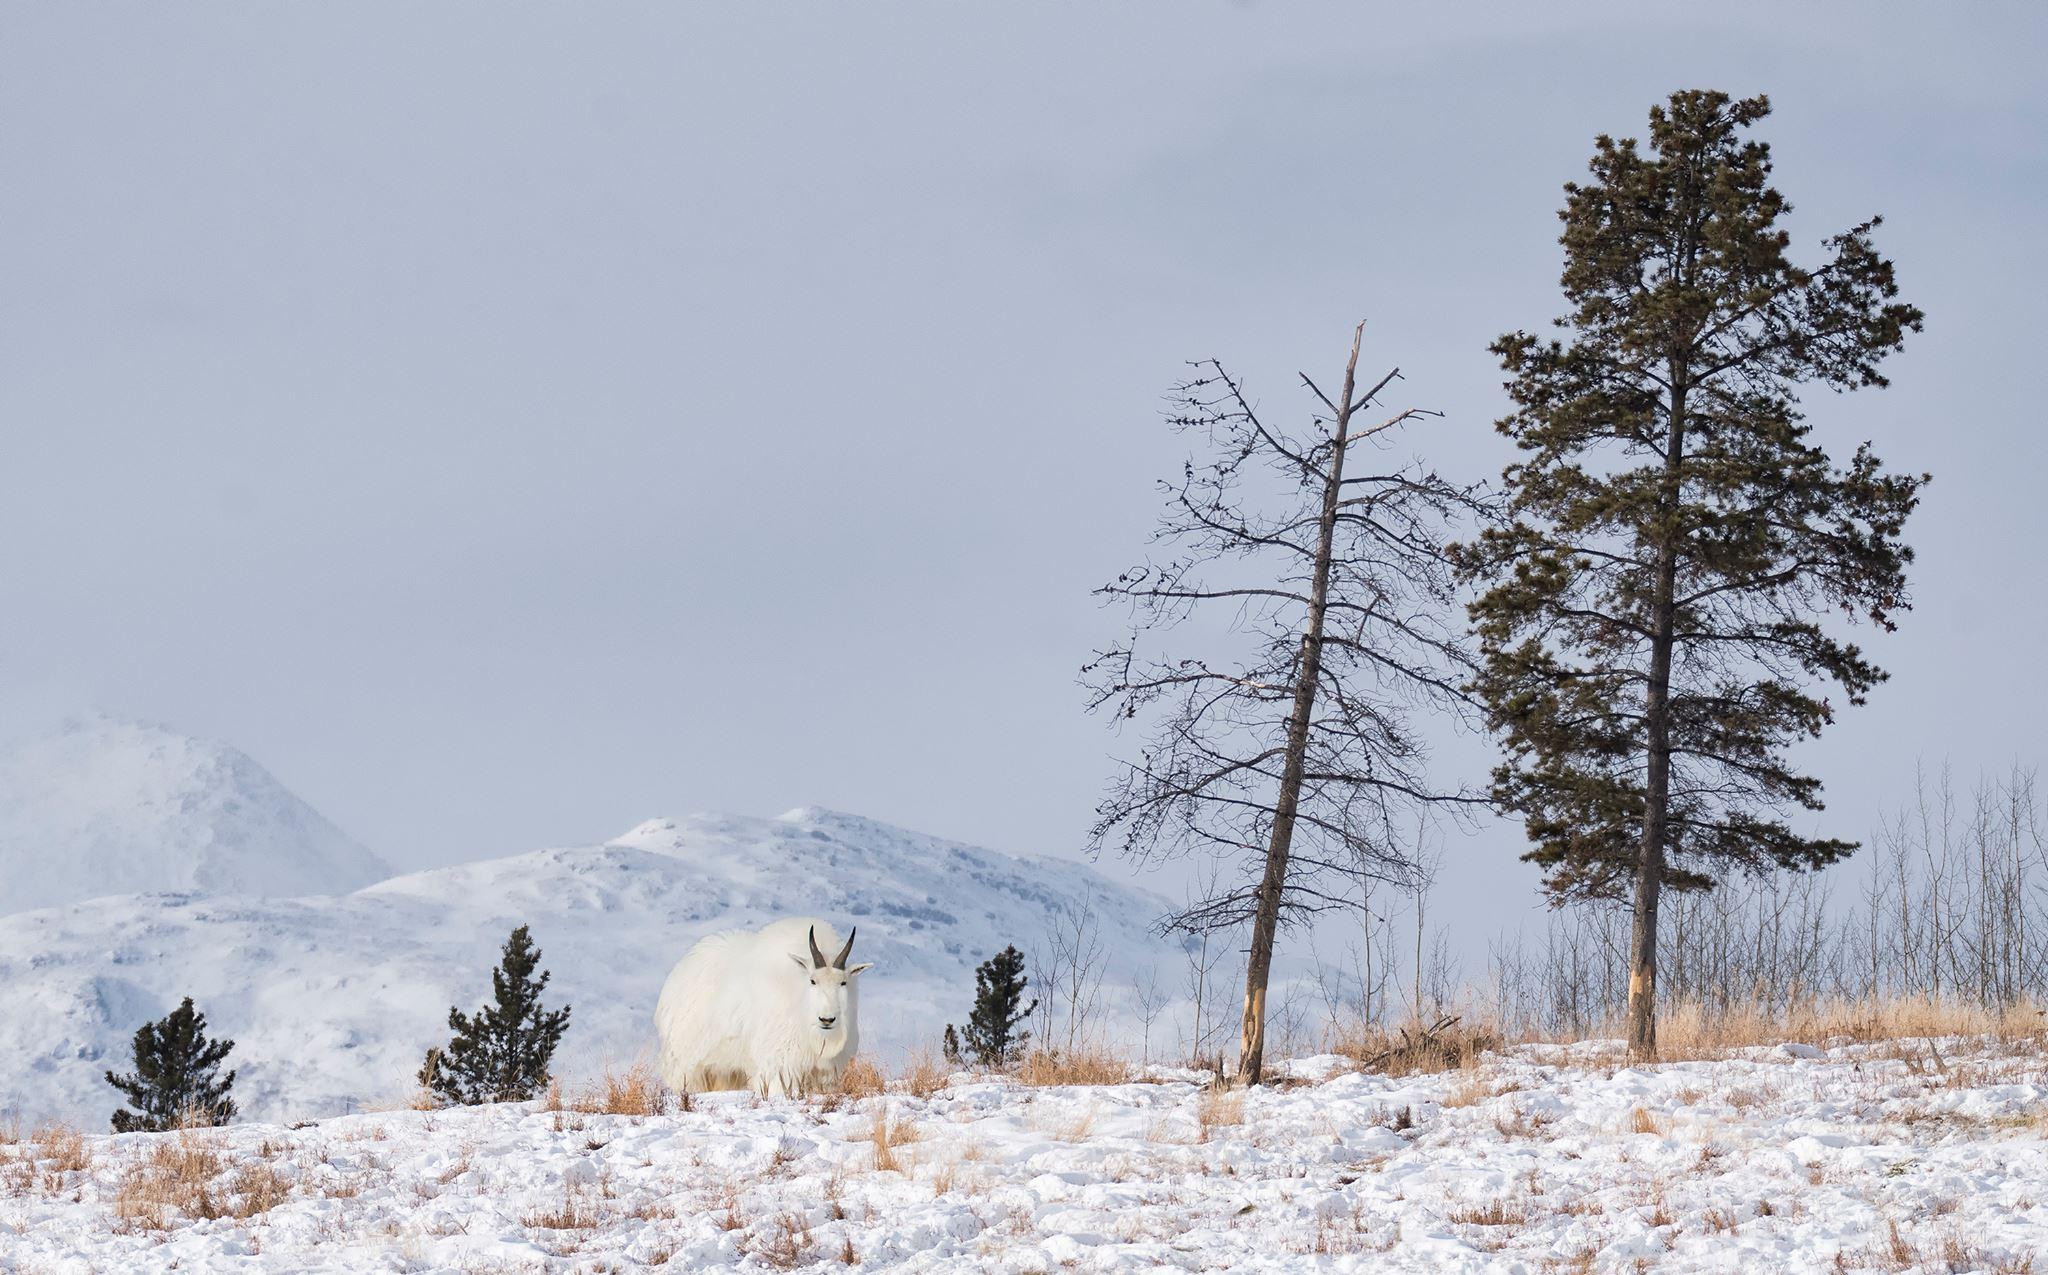 Photo Credit: Kevin Pepper, 2018 Yukon Workshop